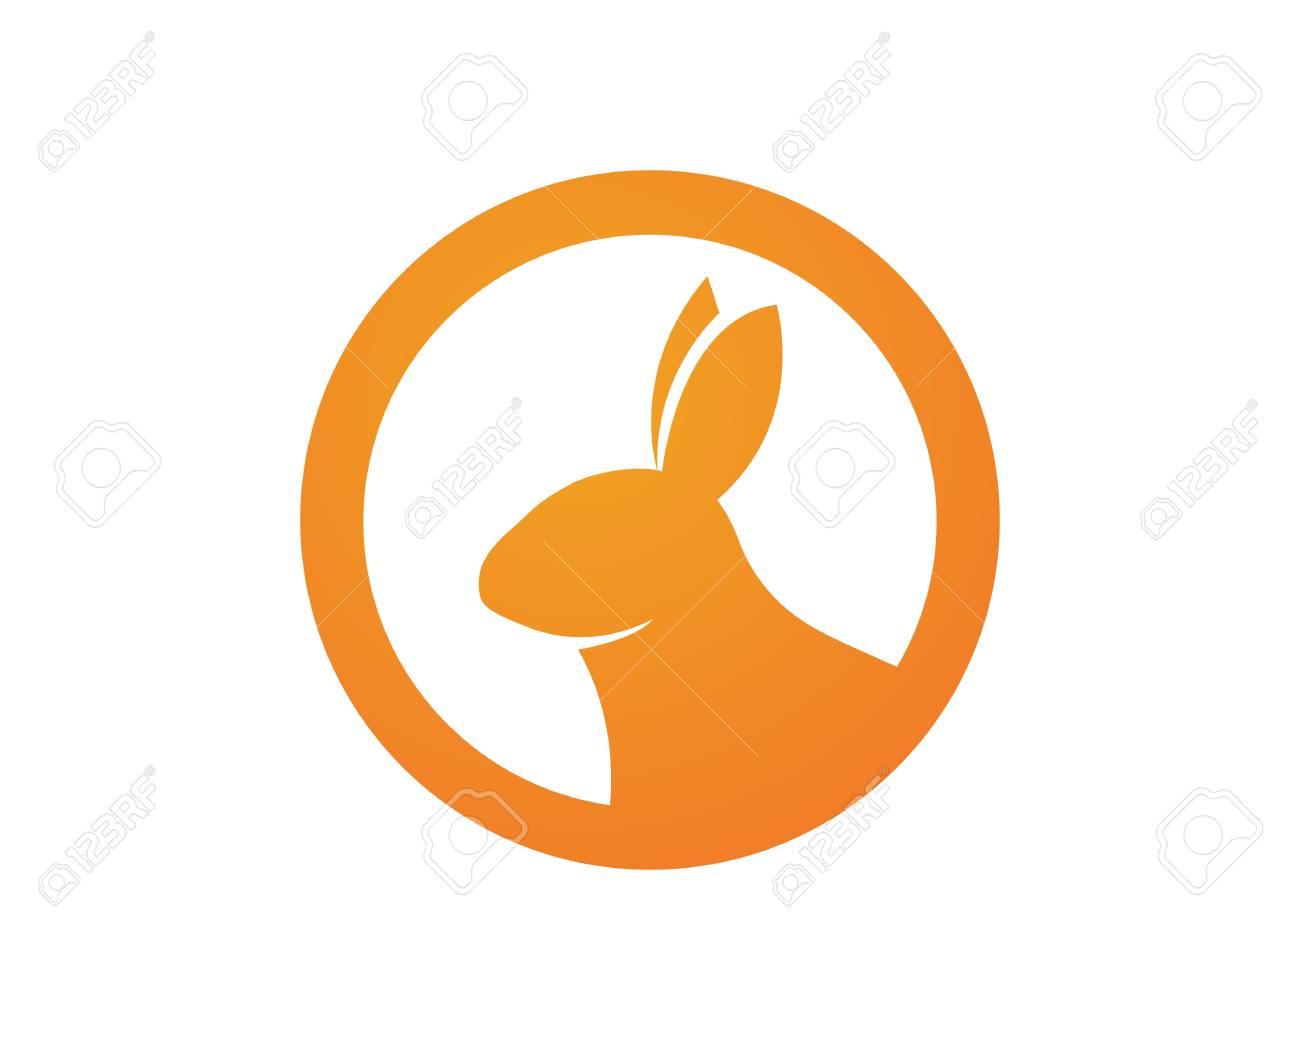 rabbit symbols template royalty free cliparts vectors and stock